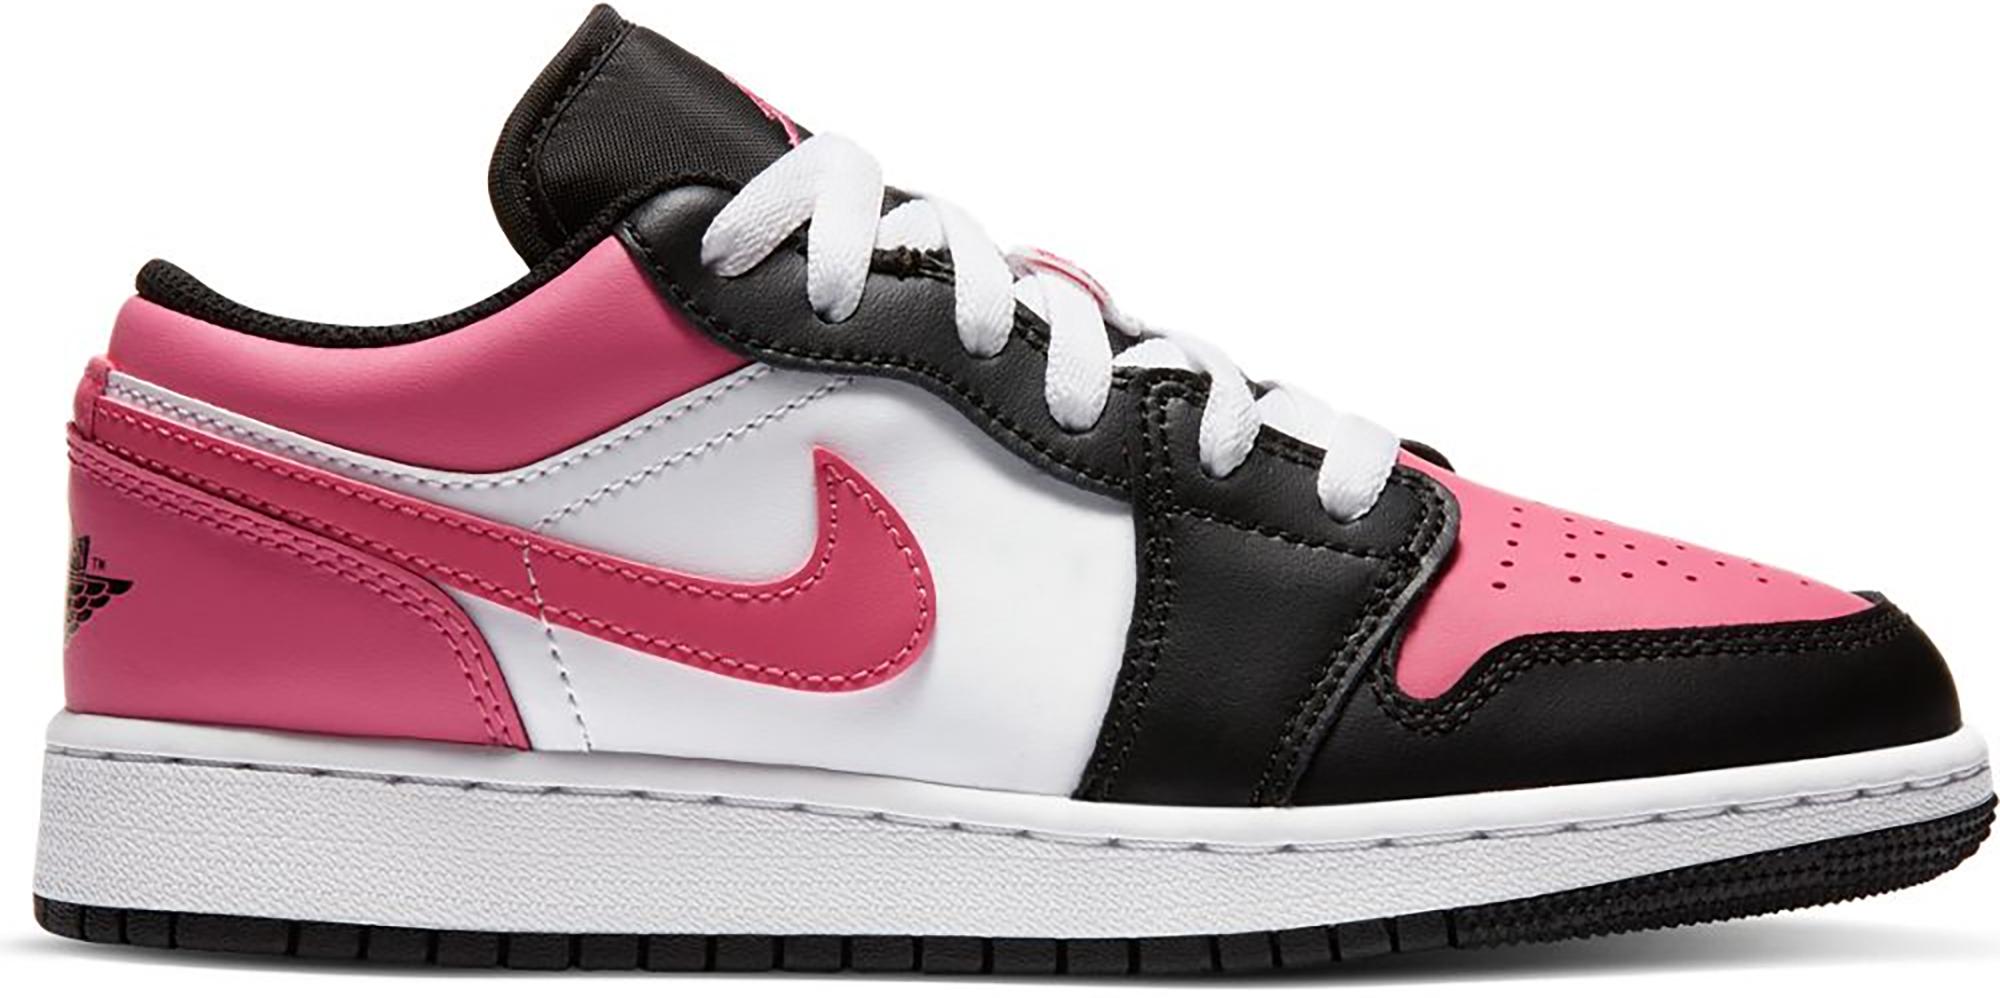 Jordan 1 Low Pinksicle (GS) - 554723-106